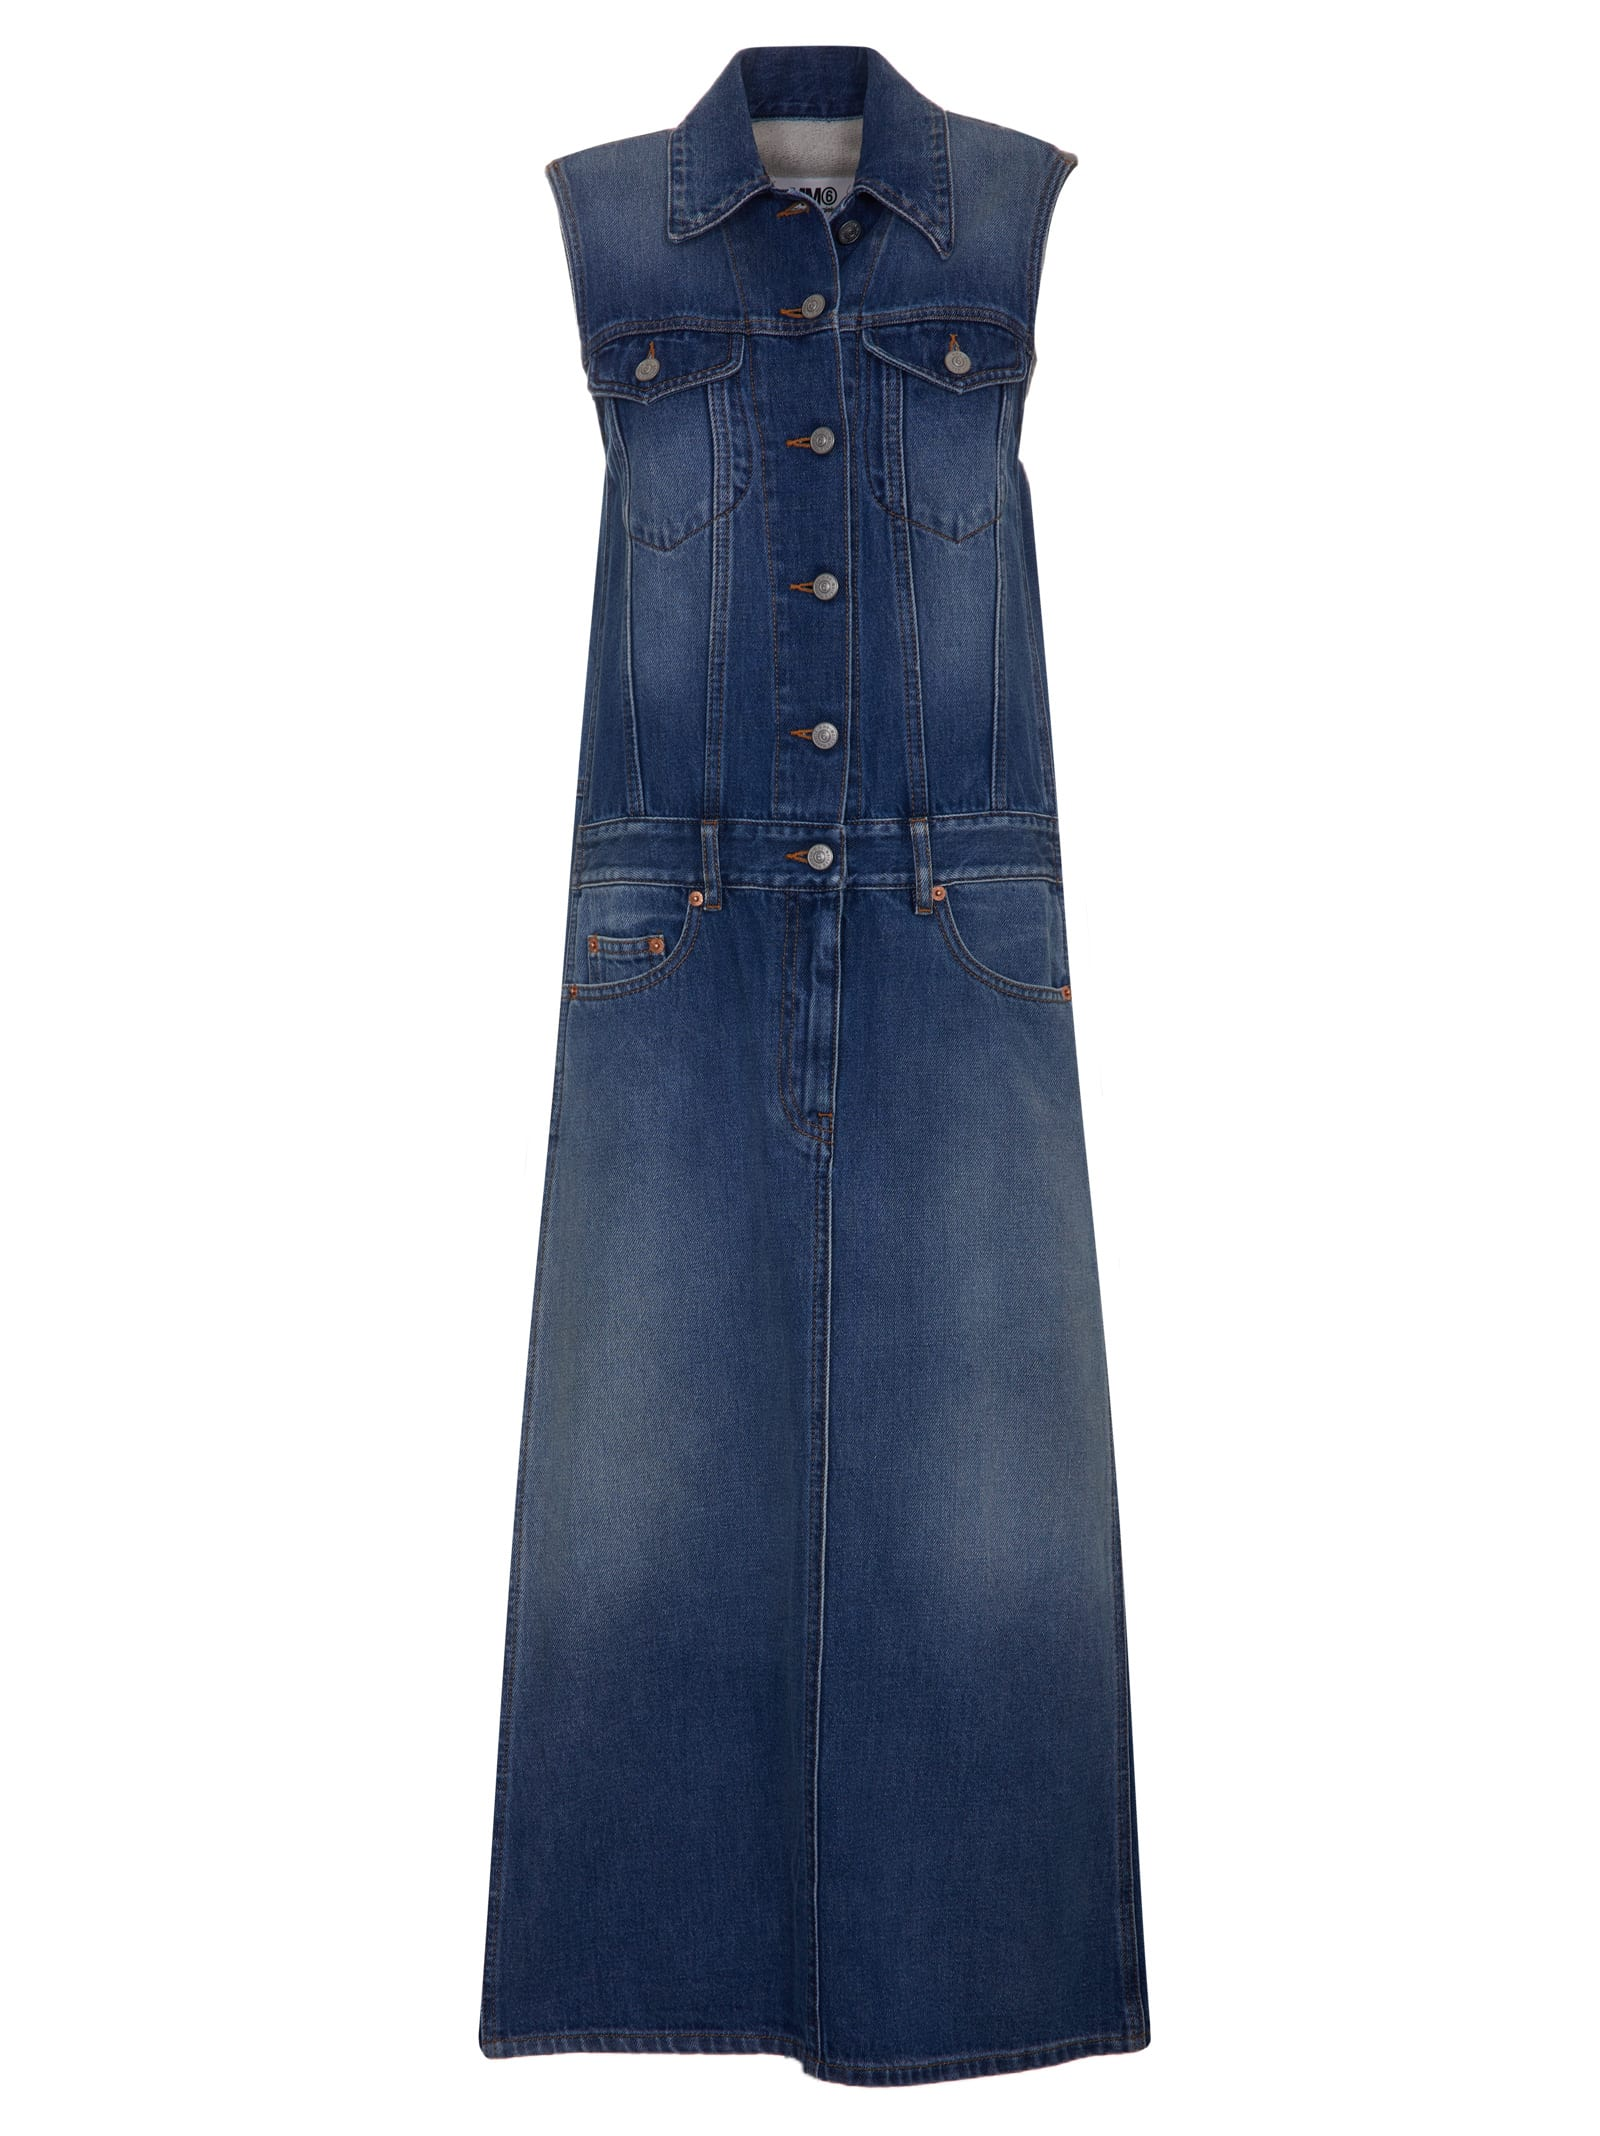 Buy MM6 Maison Margiela Denim Dress online, shop MM6 Maison Margiela with free shipping